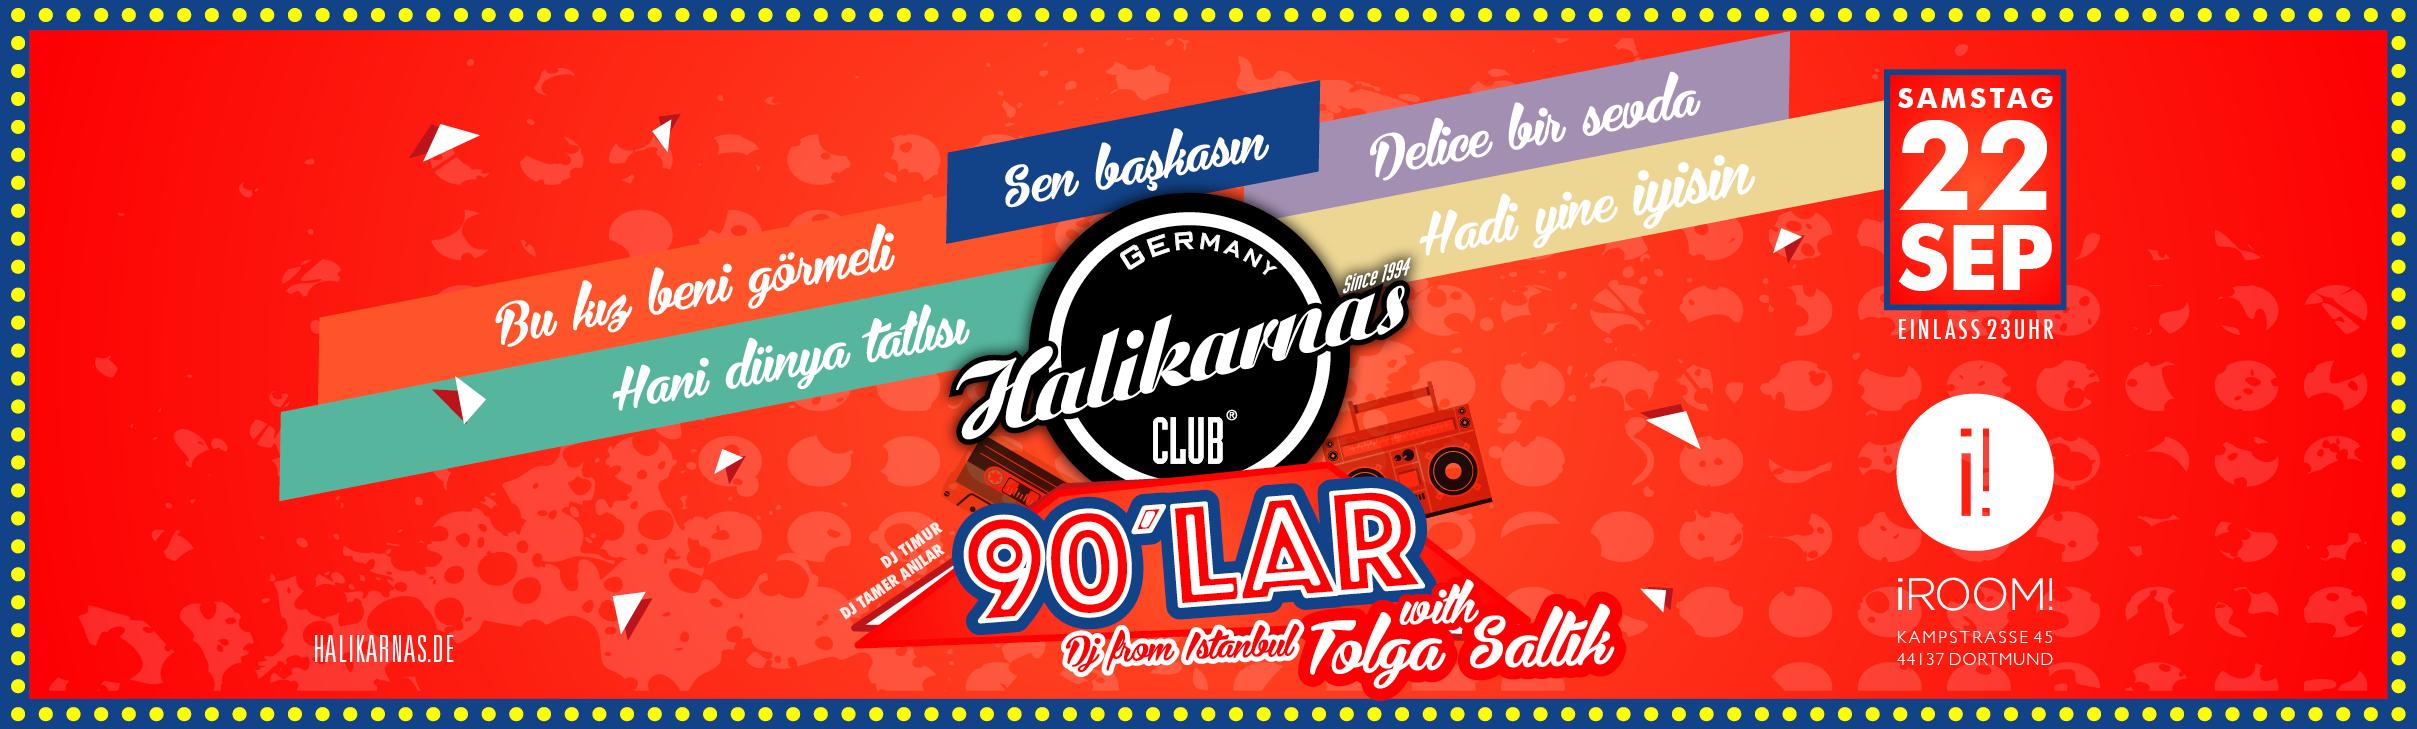 22.09. Halikarnas 90's Turkish Pop Edition @ iRoom